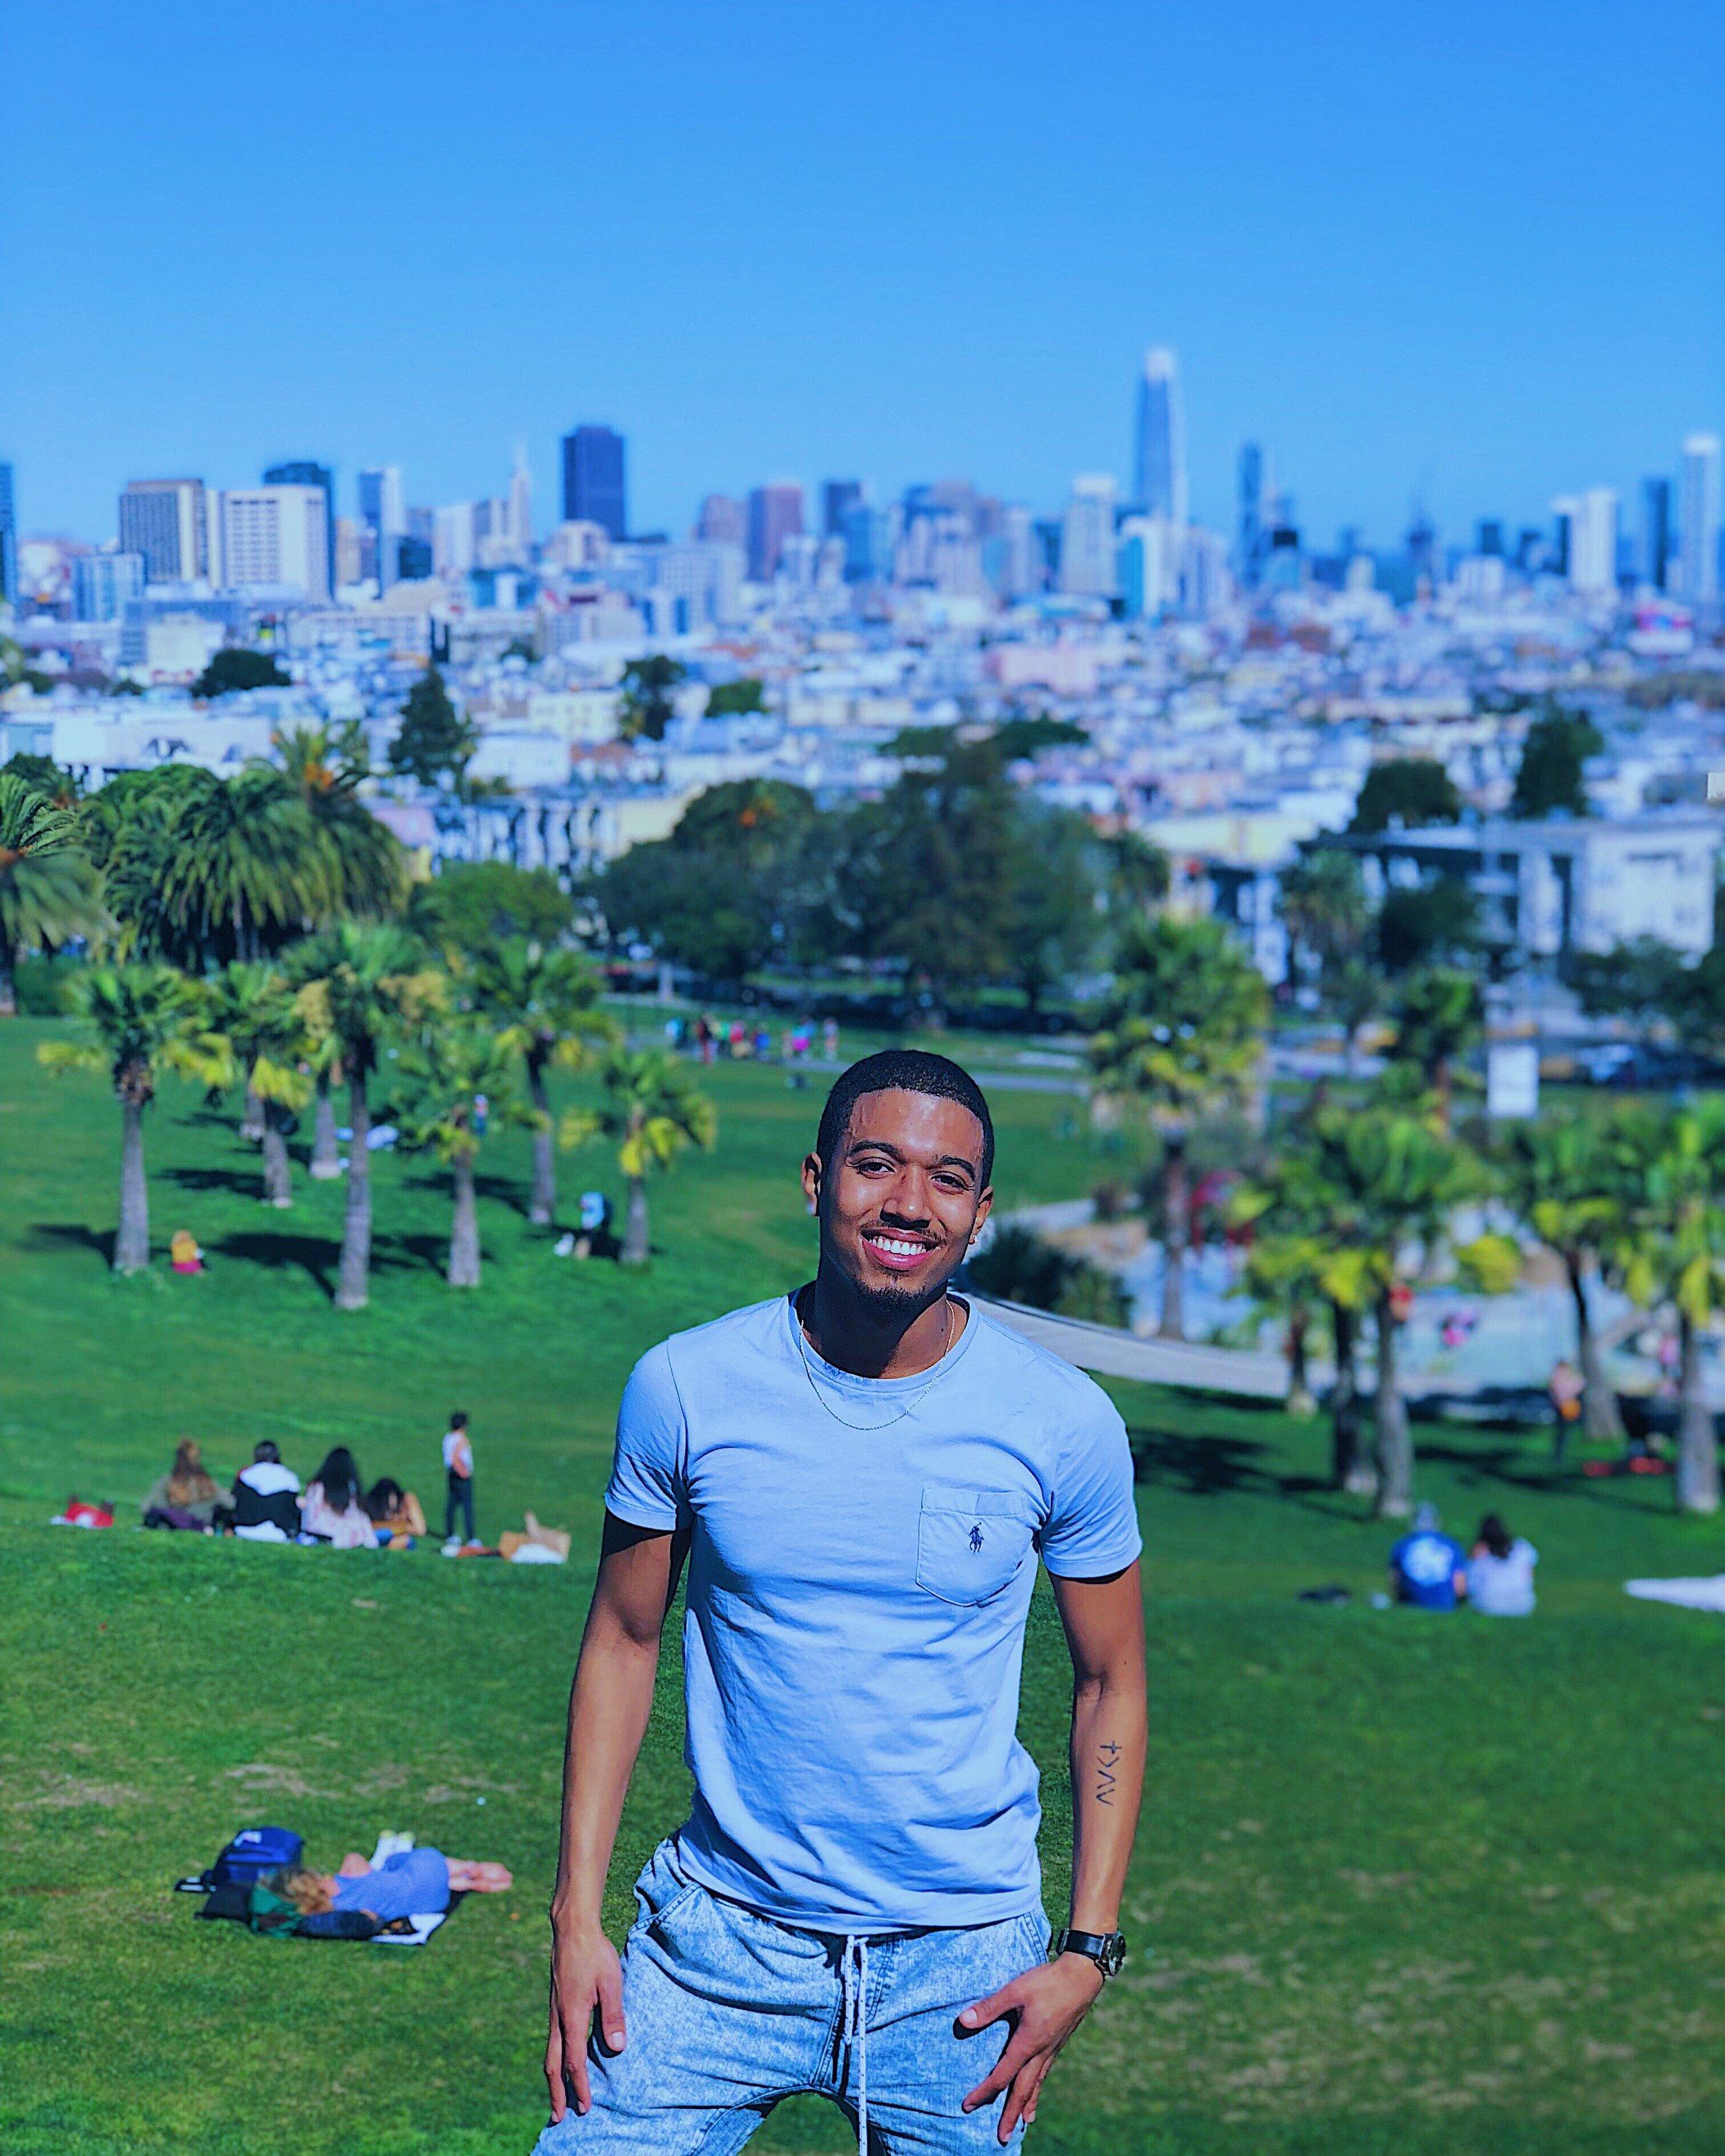 cali dream vacay 2018 - San Francisco Bay Area, California